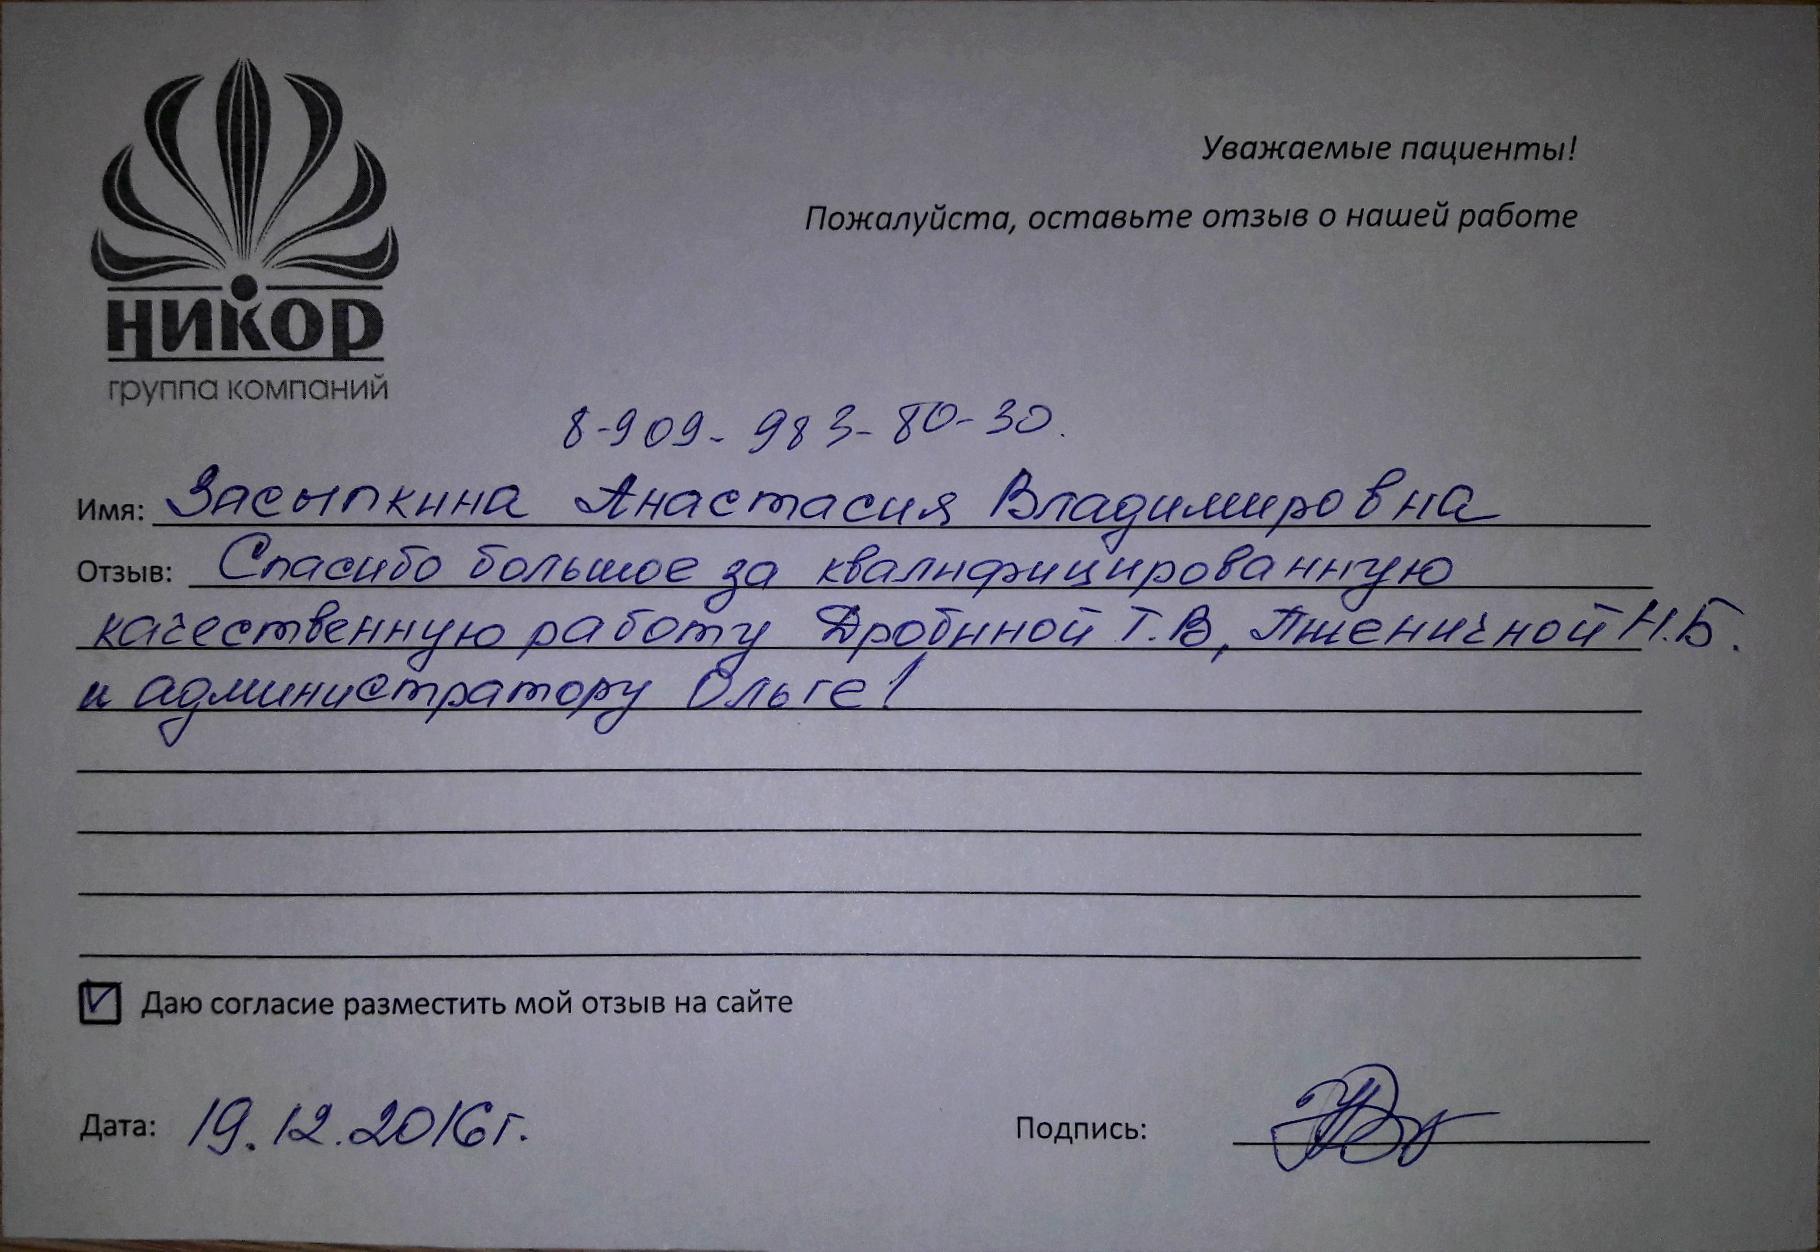 Засыпкина Анастасия Владимировна